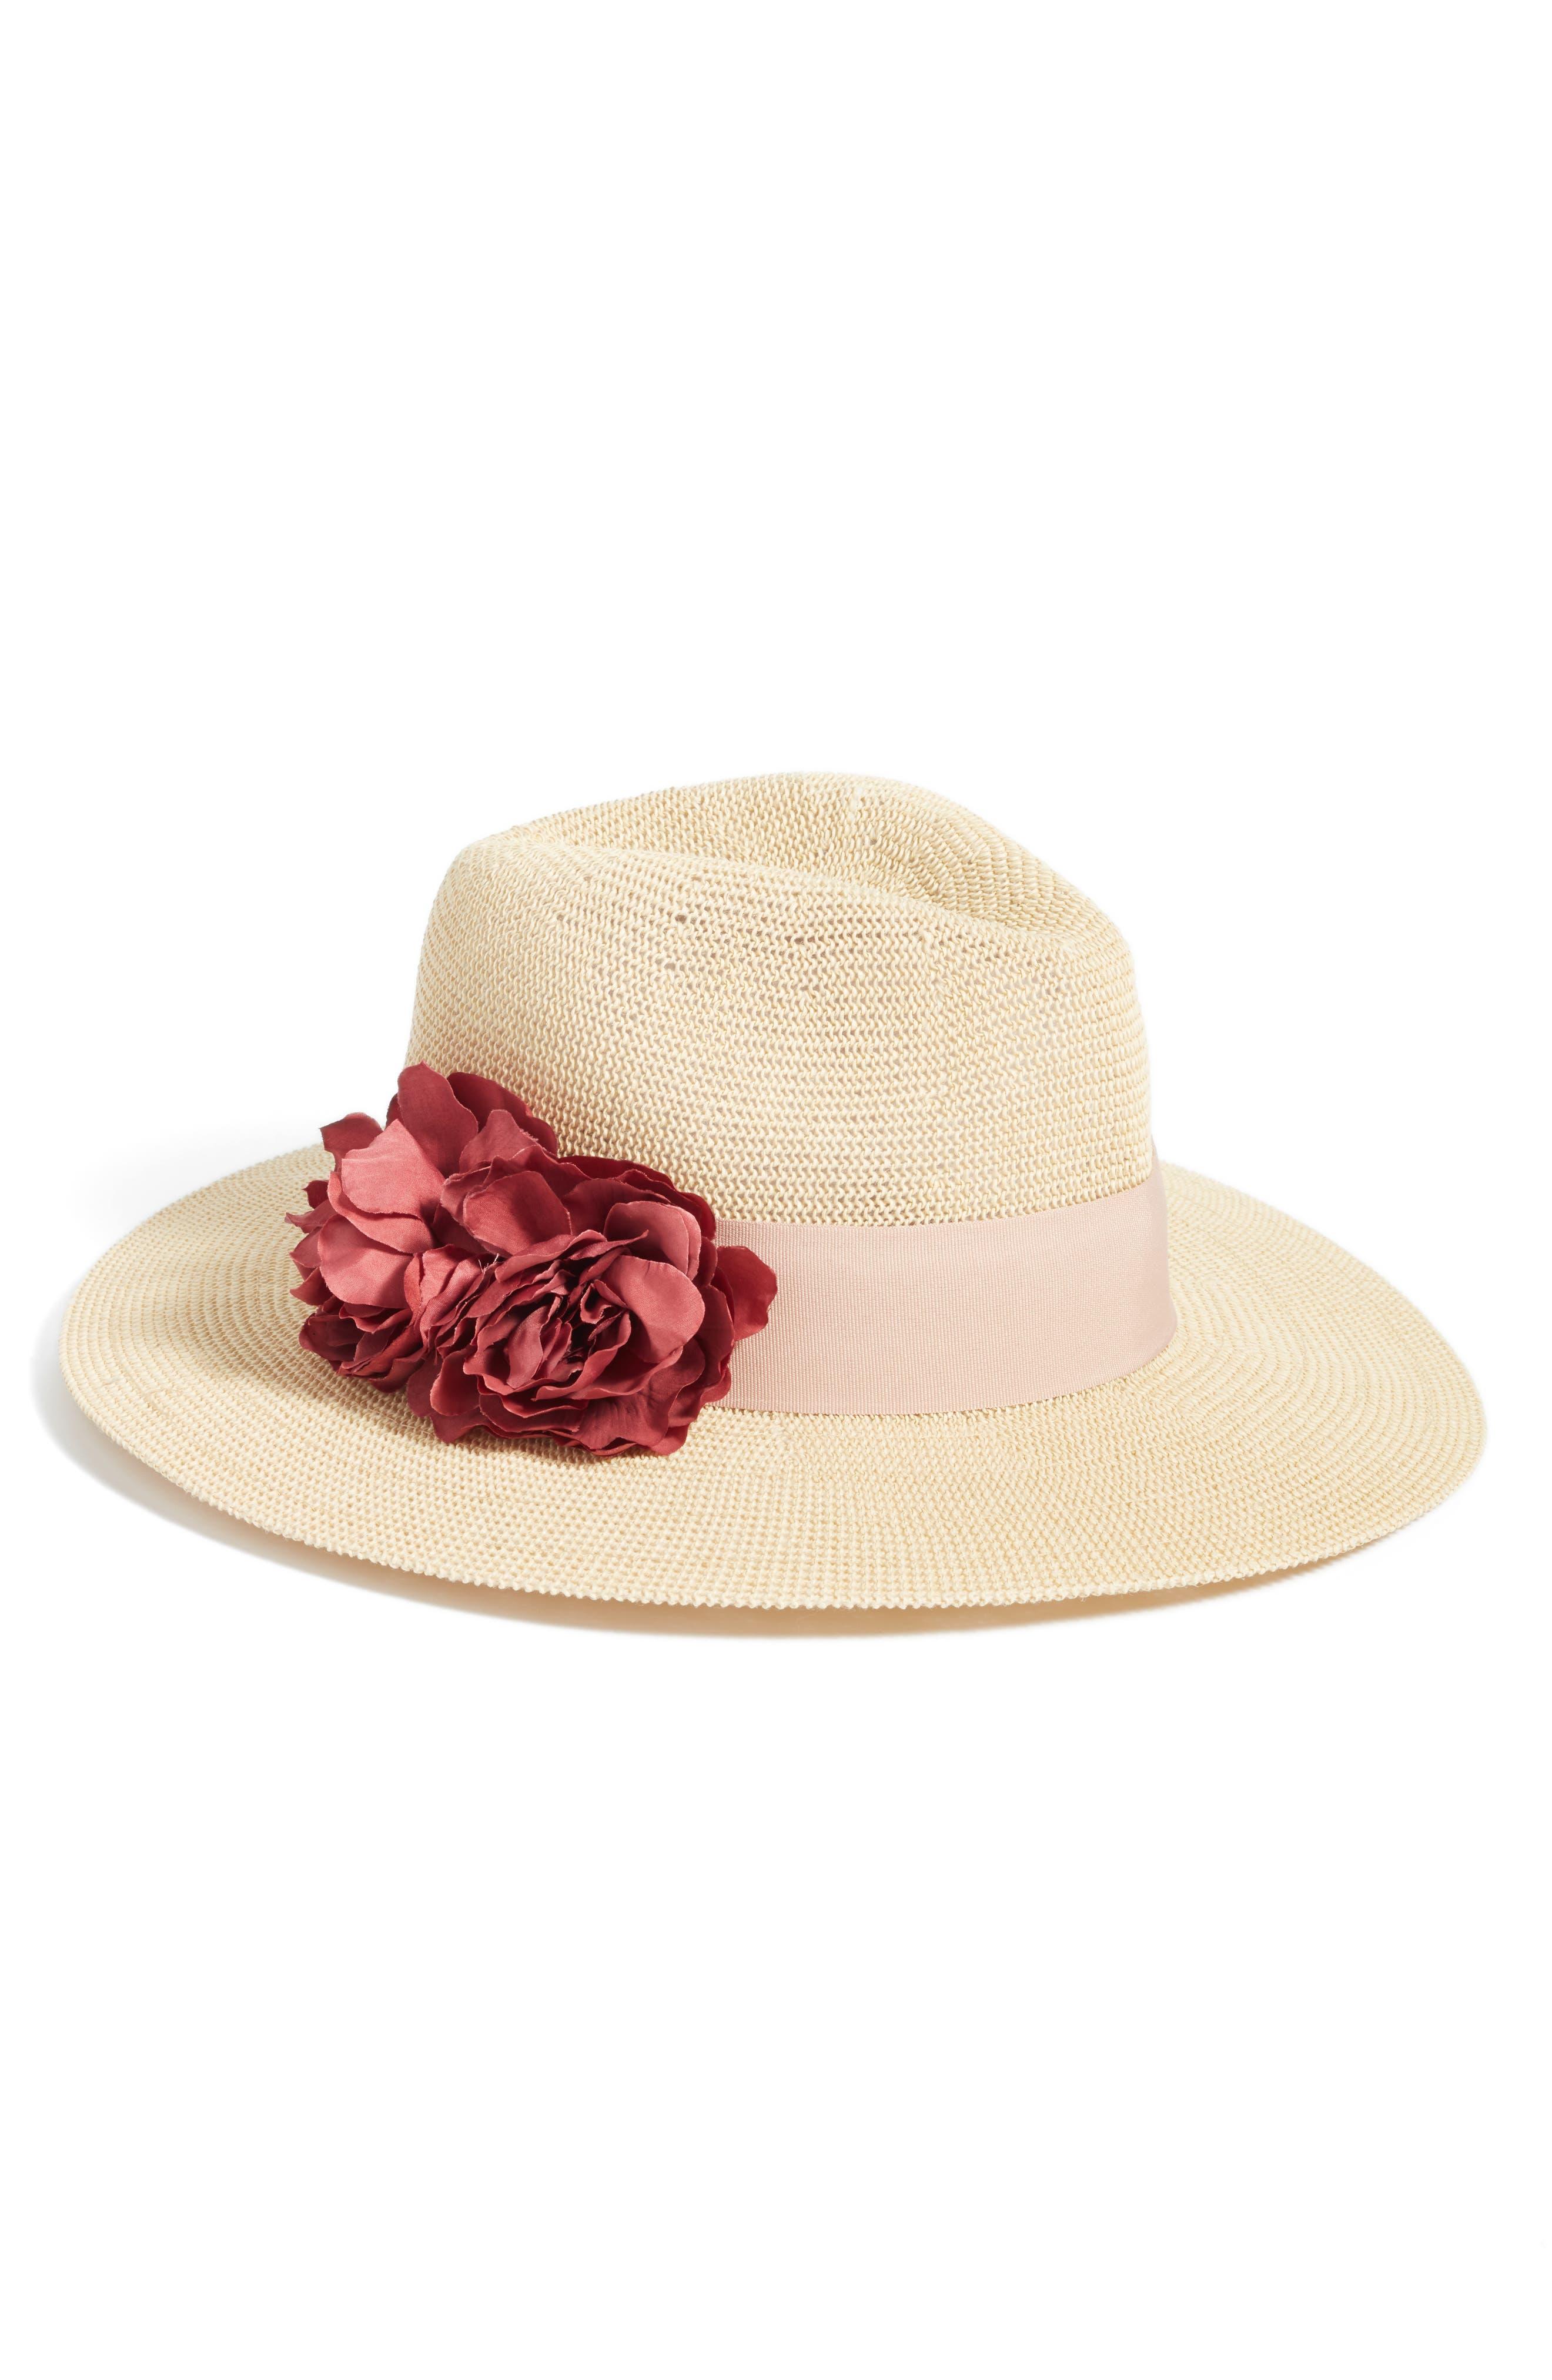 Floral Trim Straw Panama Hat,                             Main thumbnail 1, color,                             250